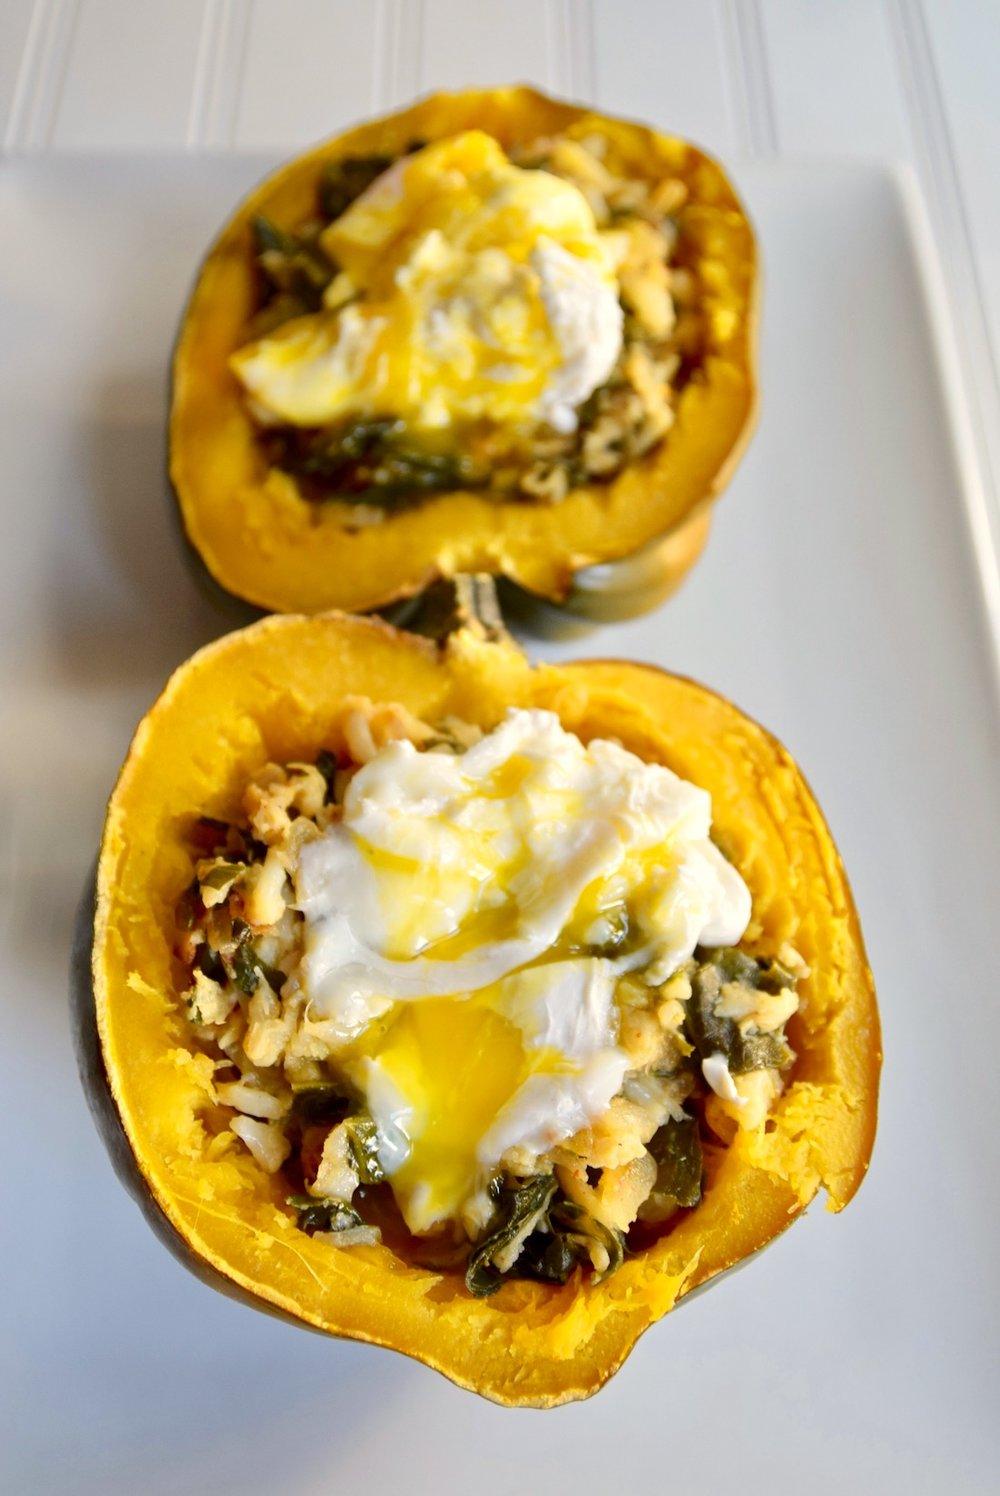 Squash breakfast bowl - paleo, gluten free, dairy free